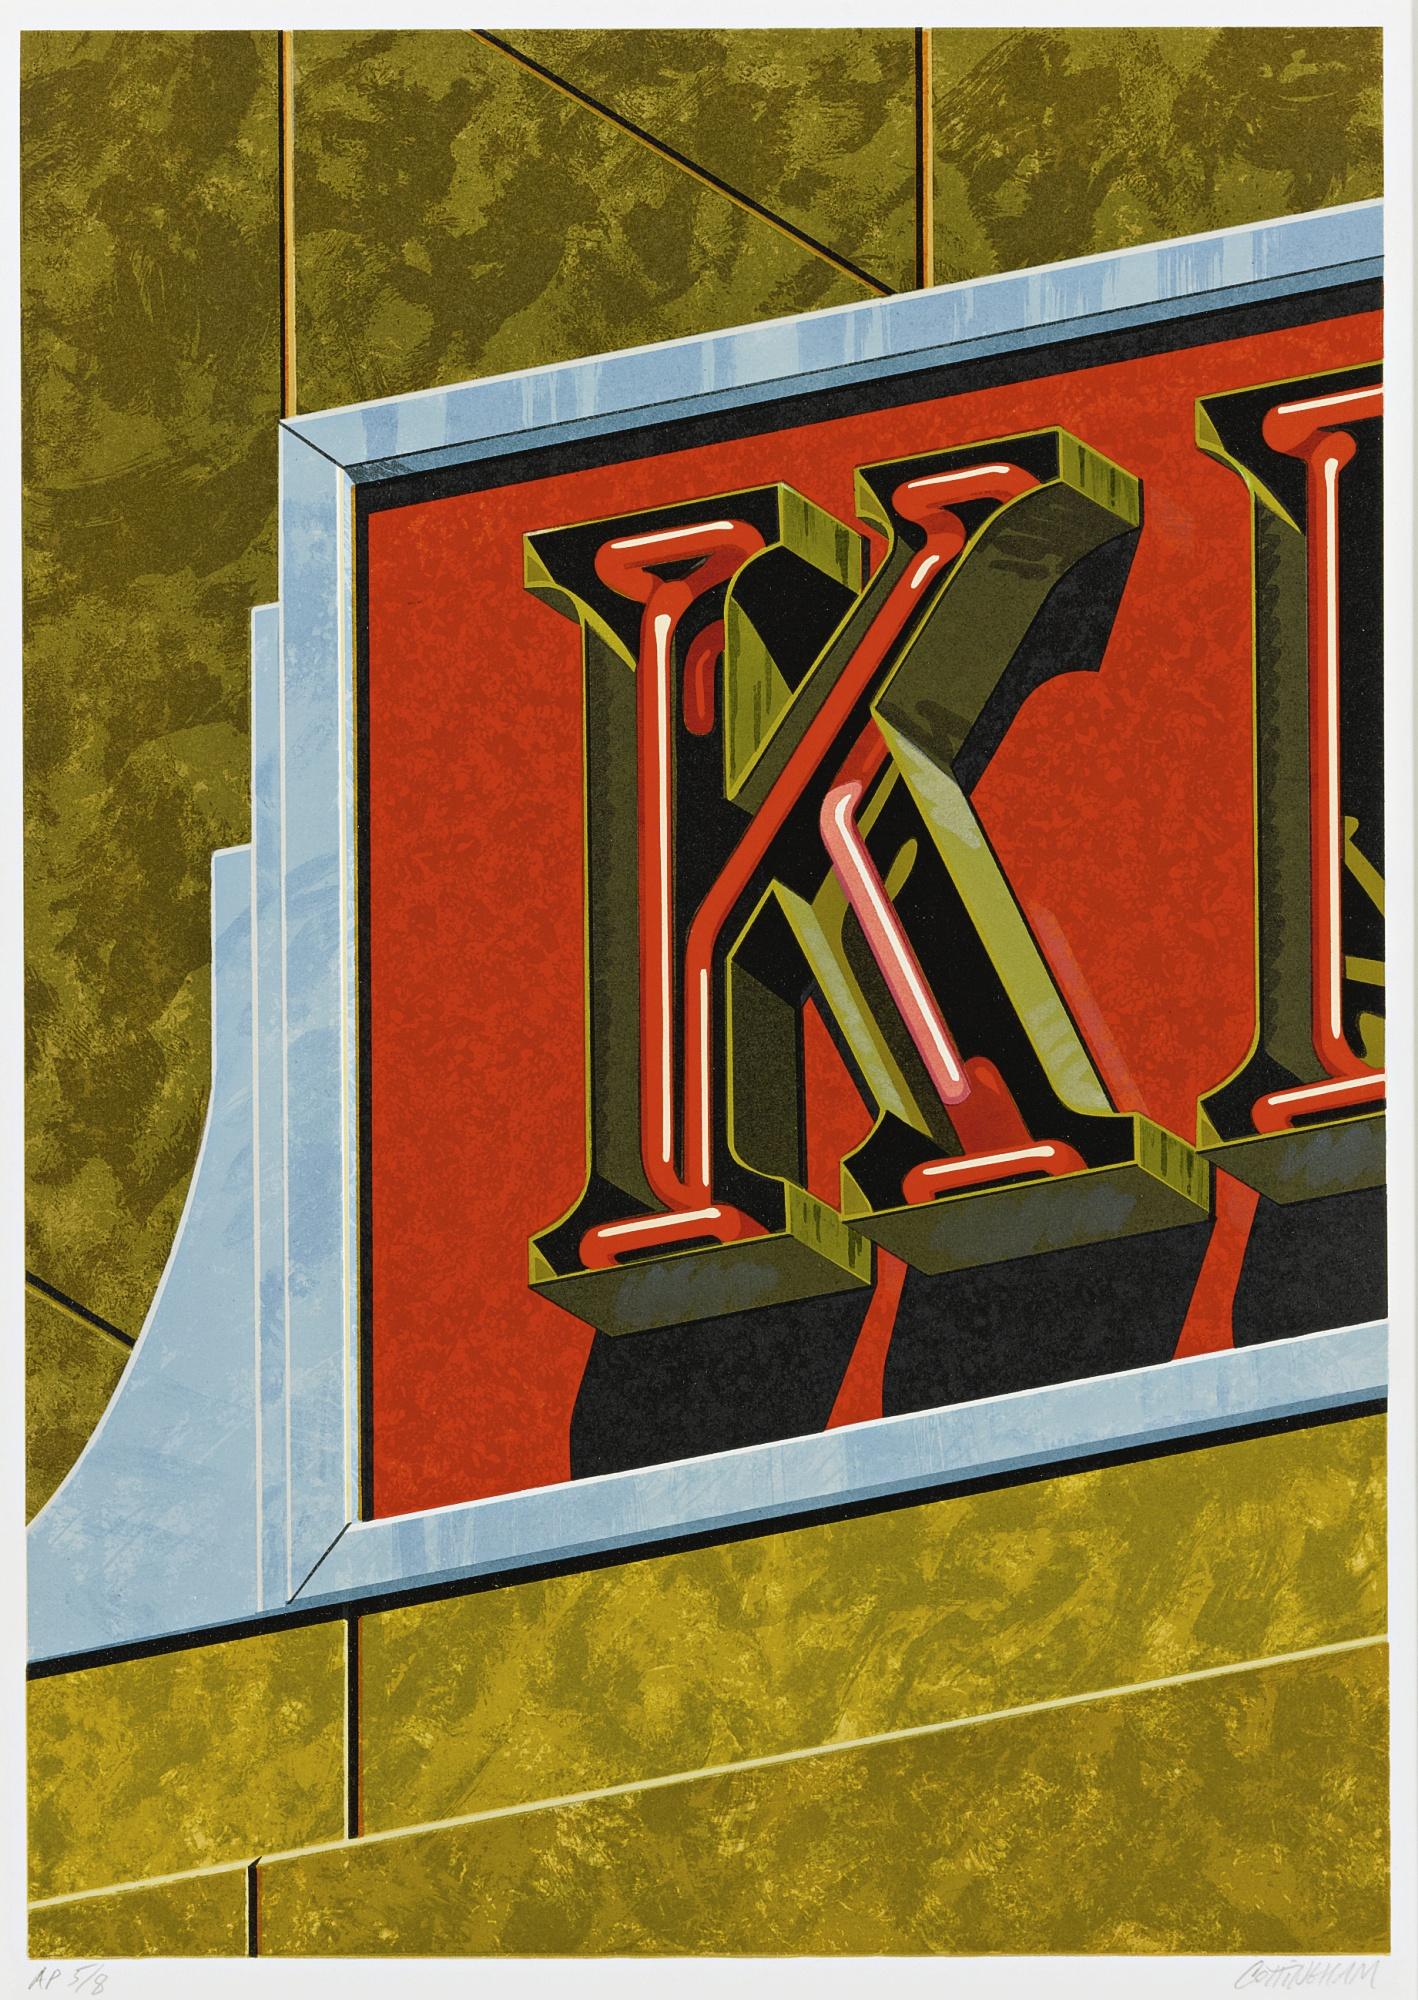 Robert Cottingham-An American Alphabet: K-1997